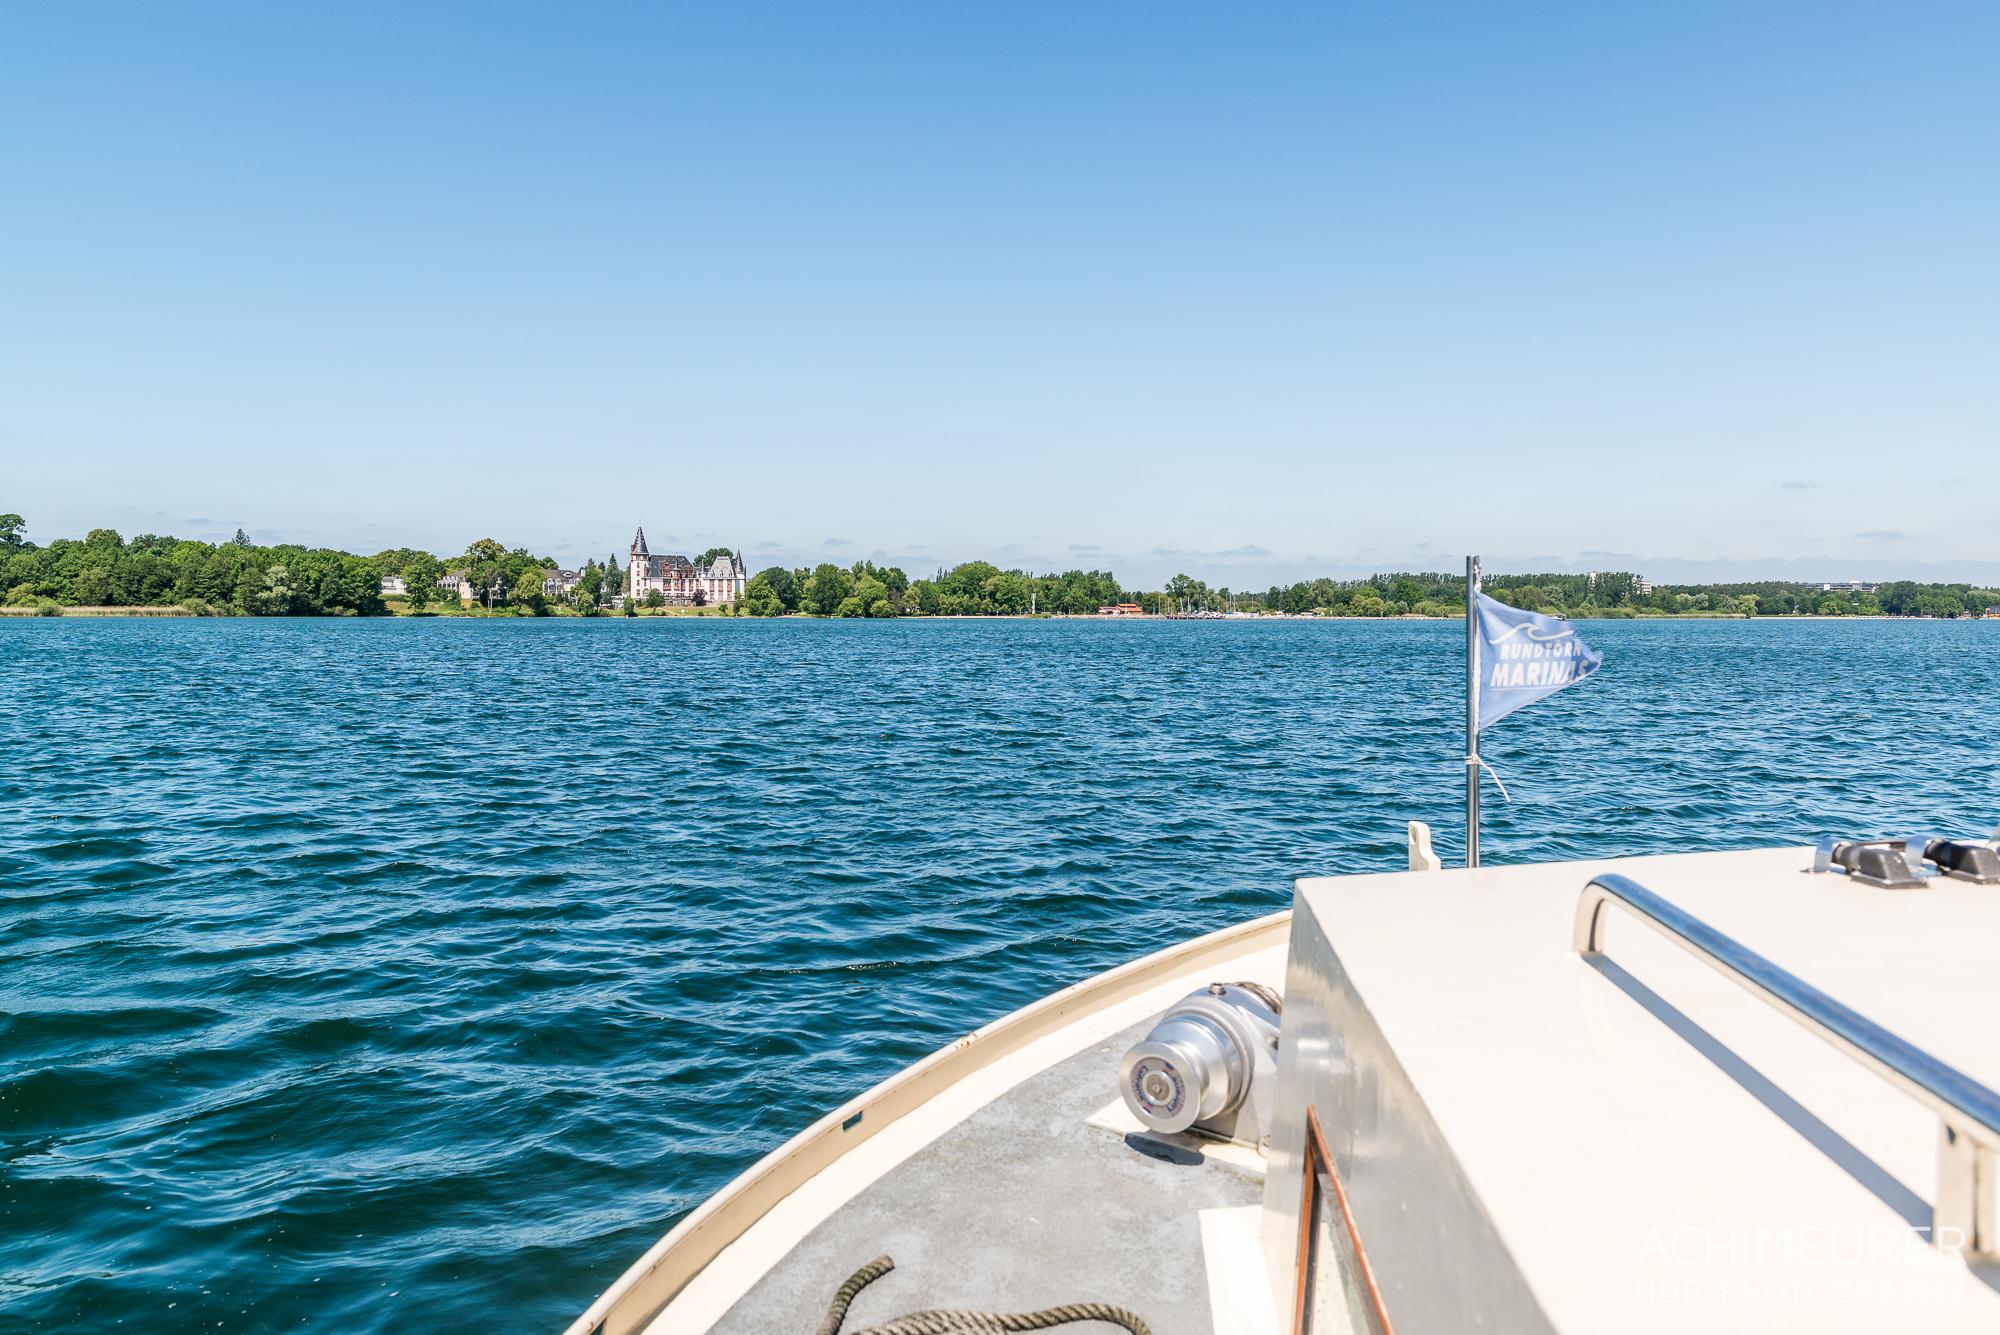 Hausboot-Kuhnle-Mueritz-Mecklenburg-Vorpommern-See_3549